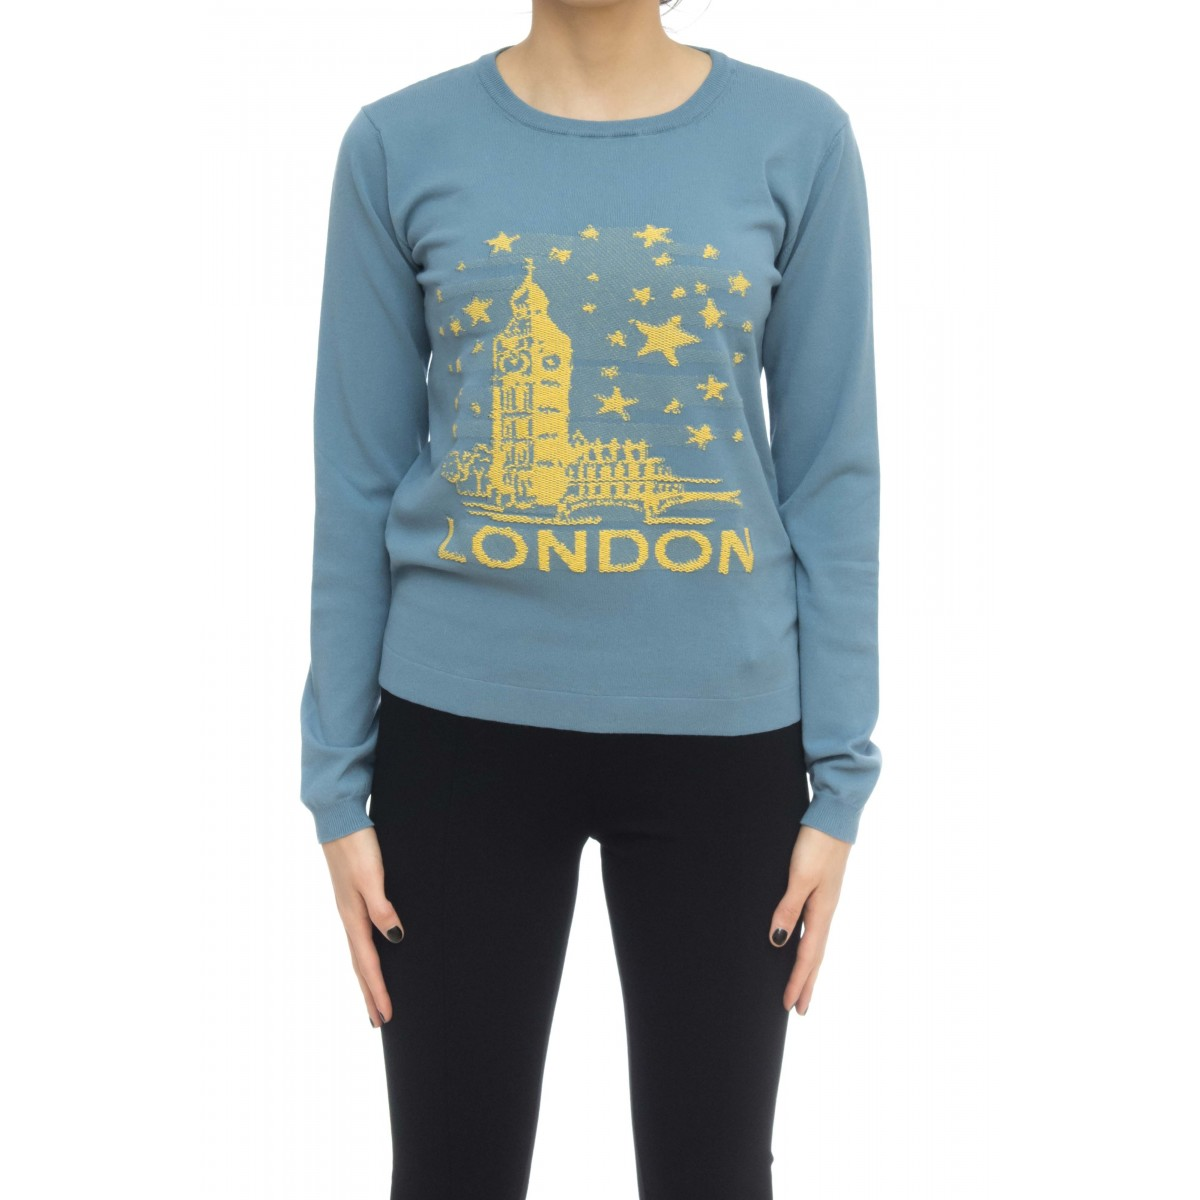 Felpa donna - 3380 maglia londra